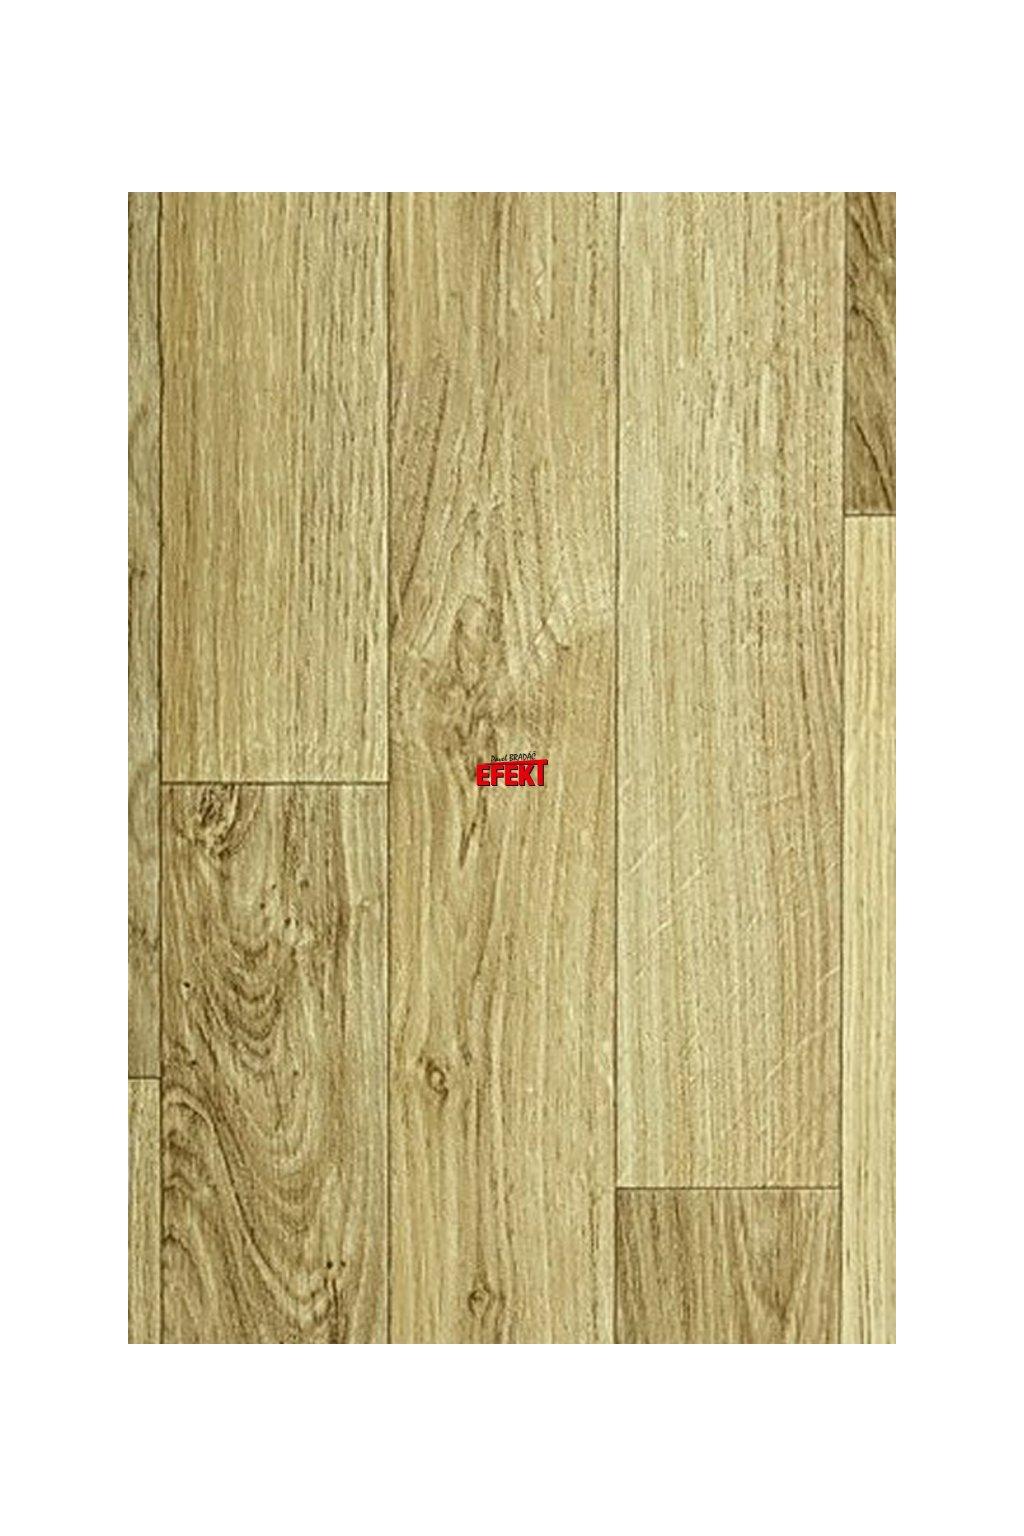 Trento-Honey Oak 263L